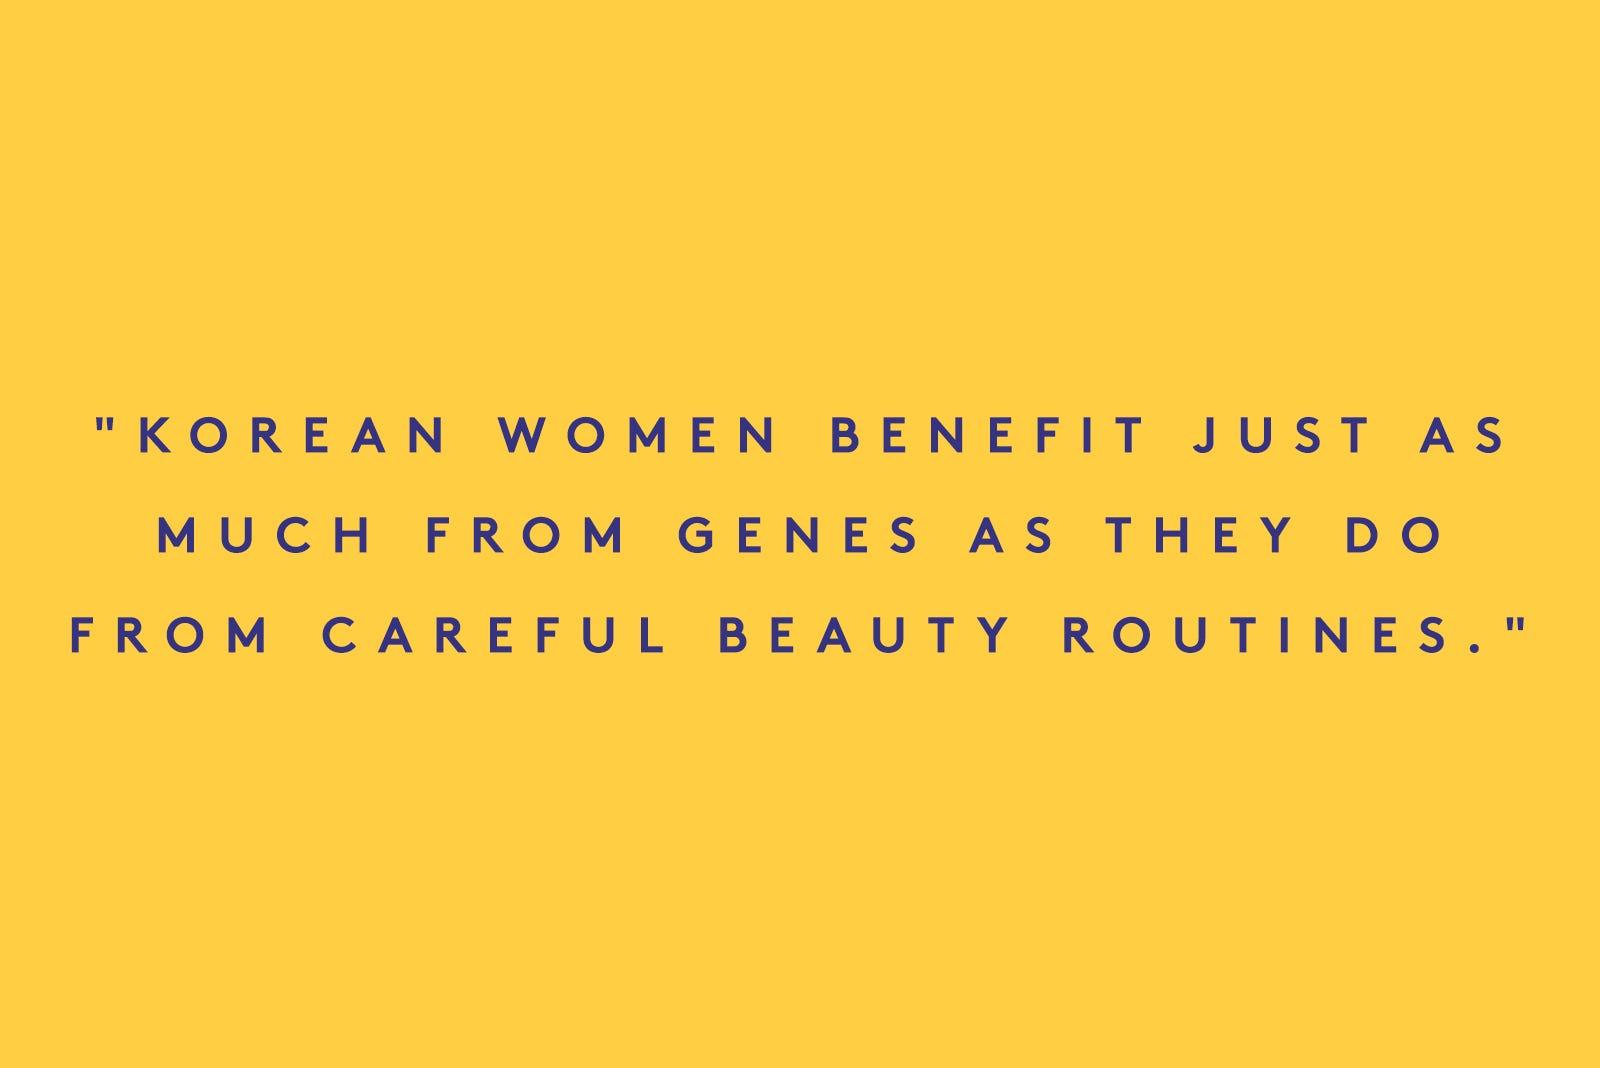 International Beauty Secrets - Skin Care Tips